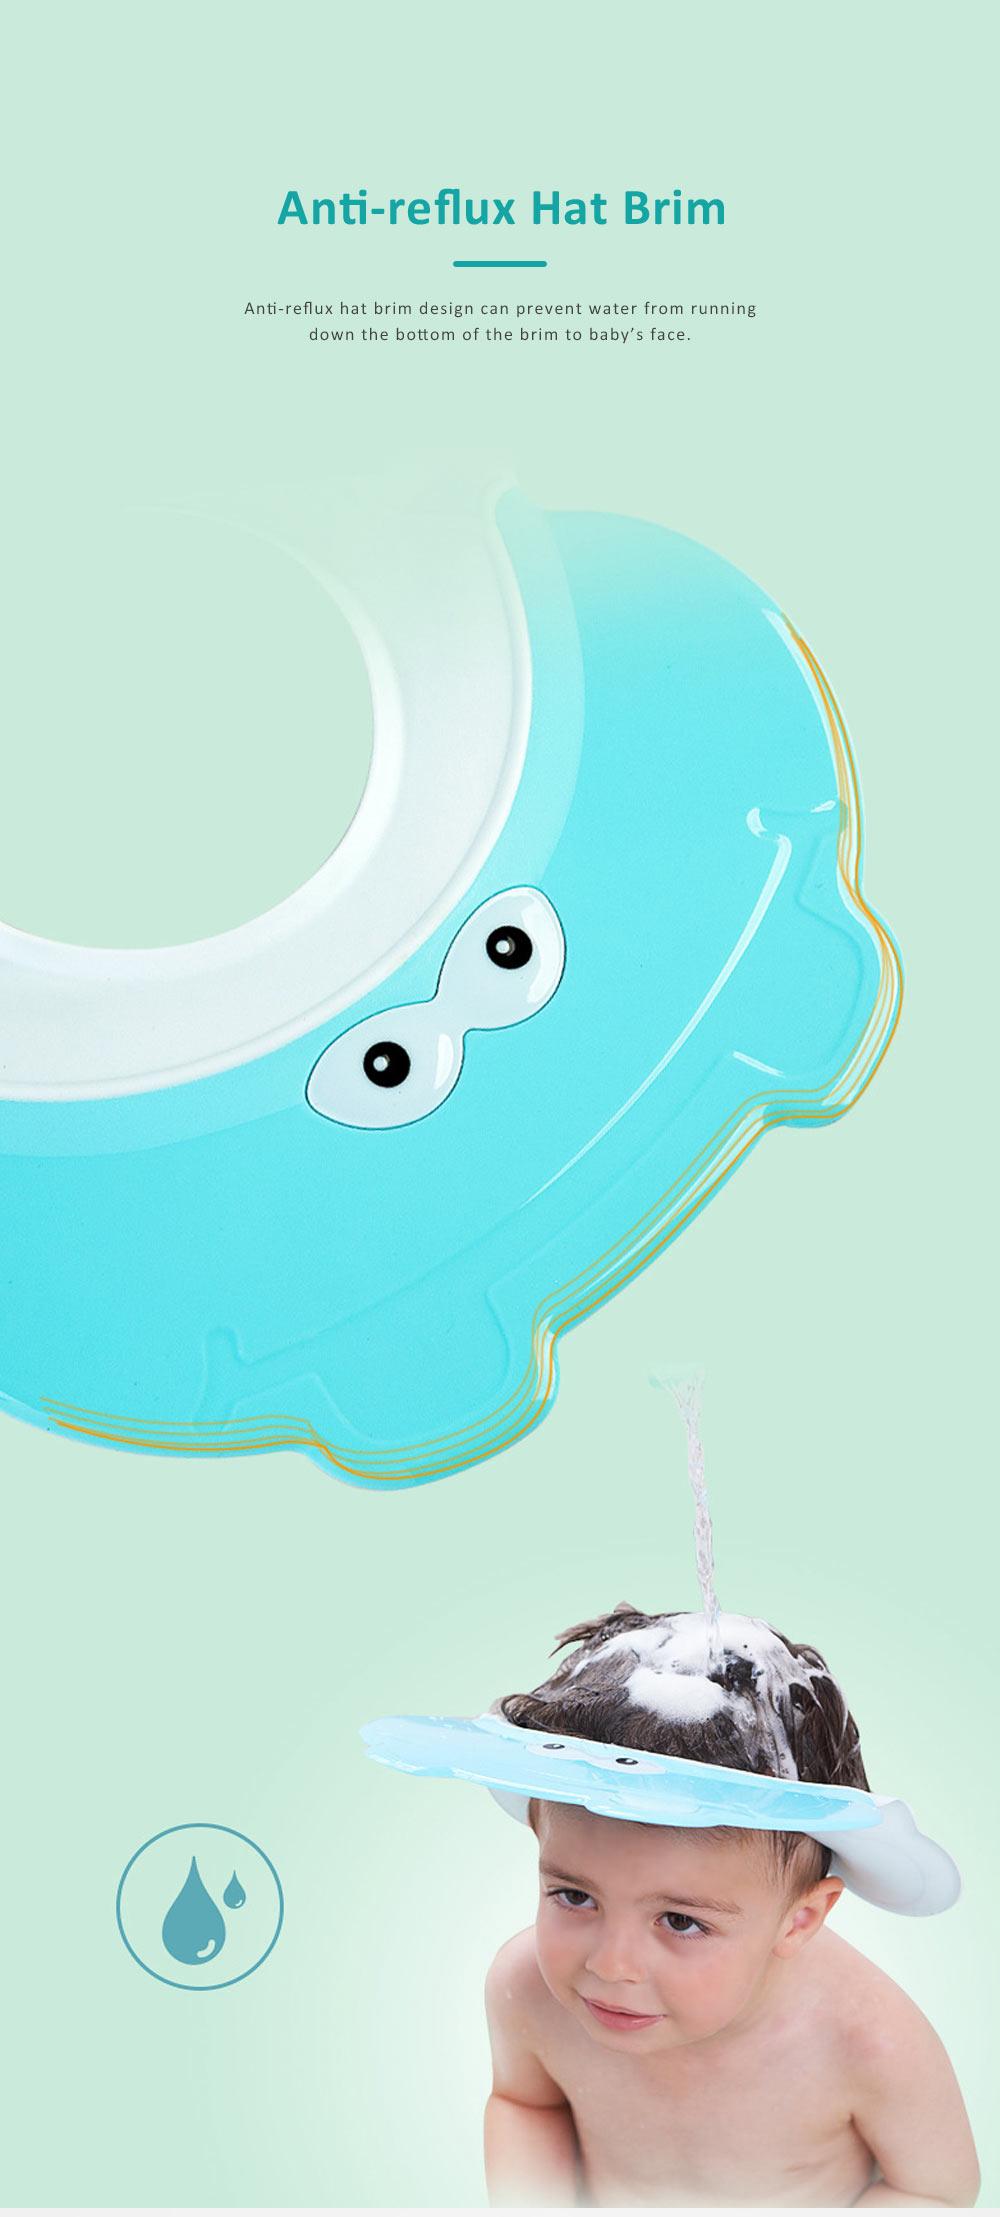 Animal Model Baby Shampoo Cap, Ultra-soft Elastic Ears Eyes Mouth Protection Shower Hat for Infants Shampoo Cap 4